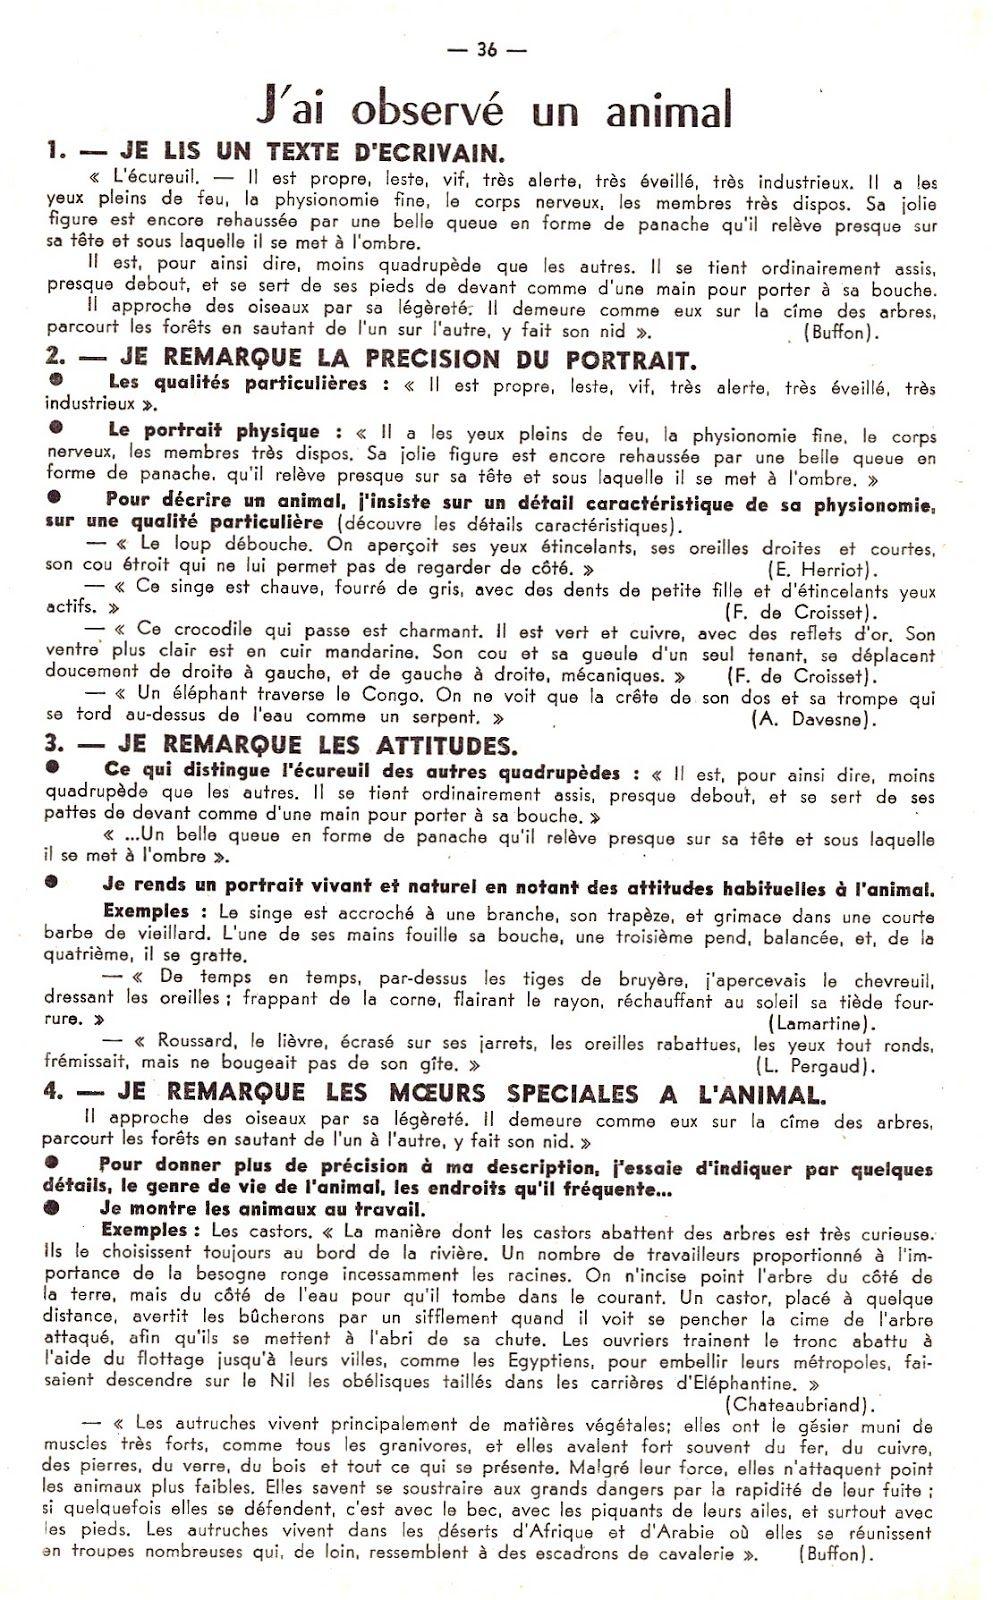 J Apprends A Rediger Cm 6e 5e 1962 Education En